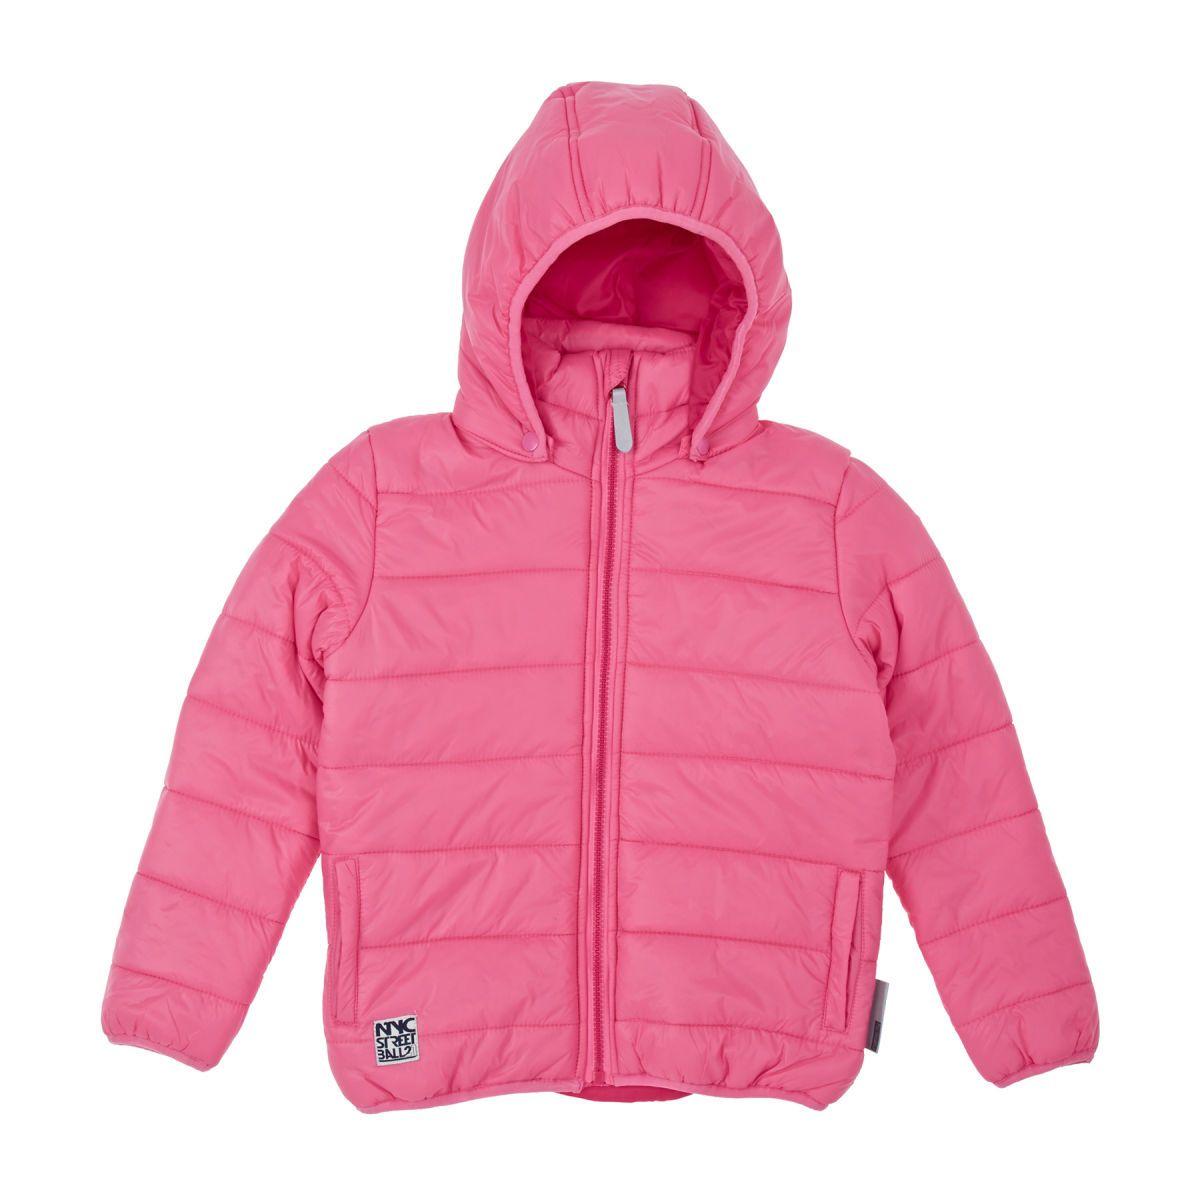 Name It Malvin Kids Jacket - Fandango Pink | Free UK Delivery